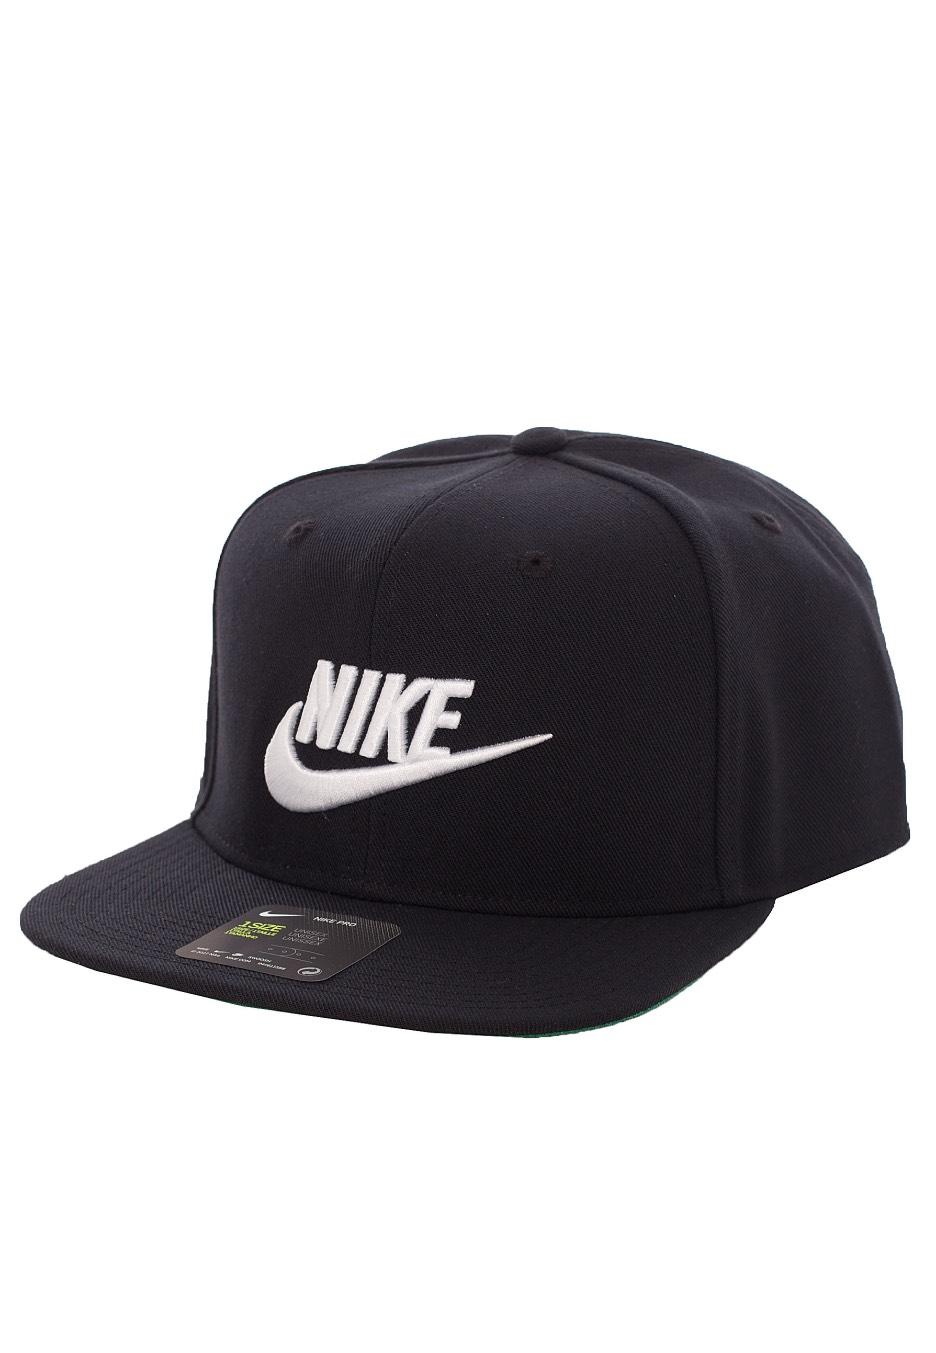 9c980995ac9 Nike - Sportswear Pro Black Pine Green Black White - Cap - Streetwear Shop  - Impericon.com UK